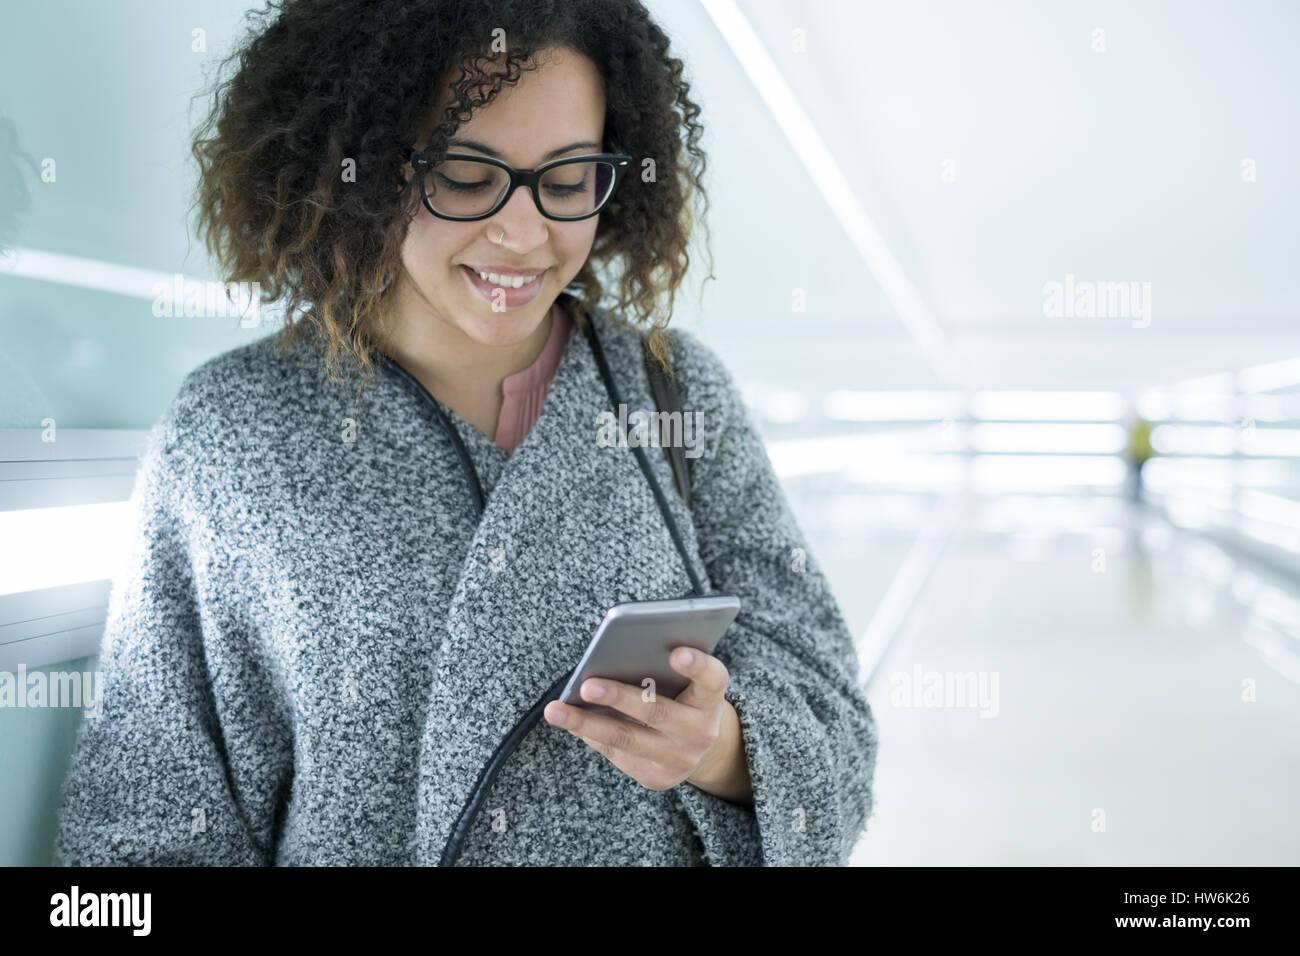 Afro American girl en utilisant un téléphone mobile Photo Stock